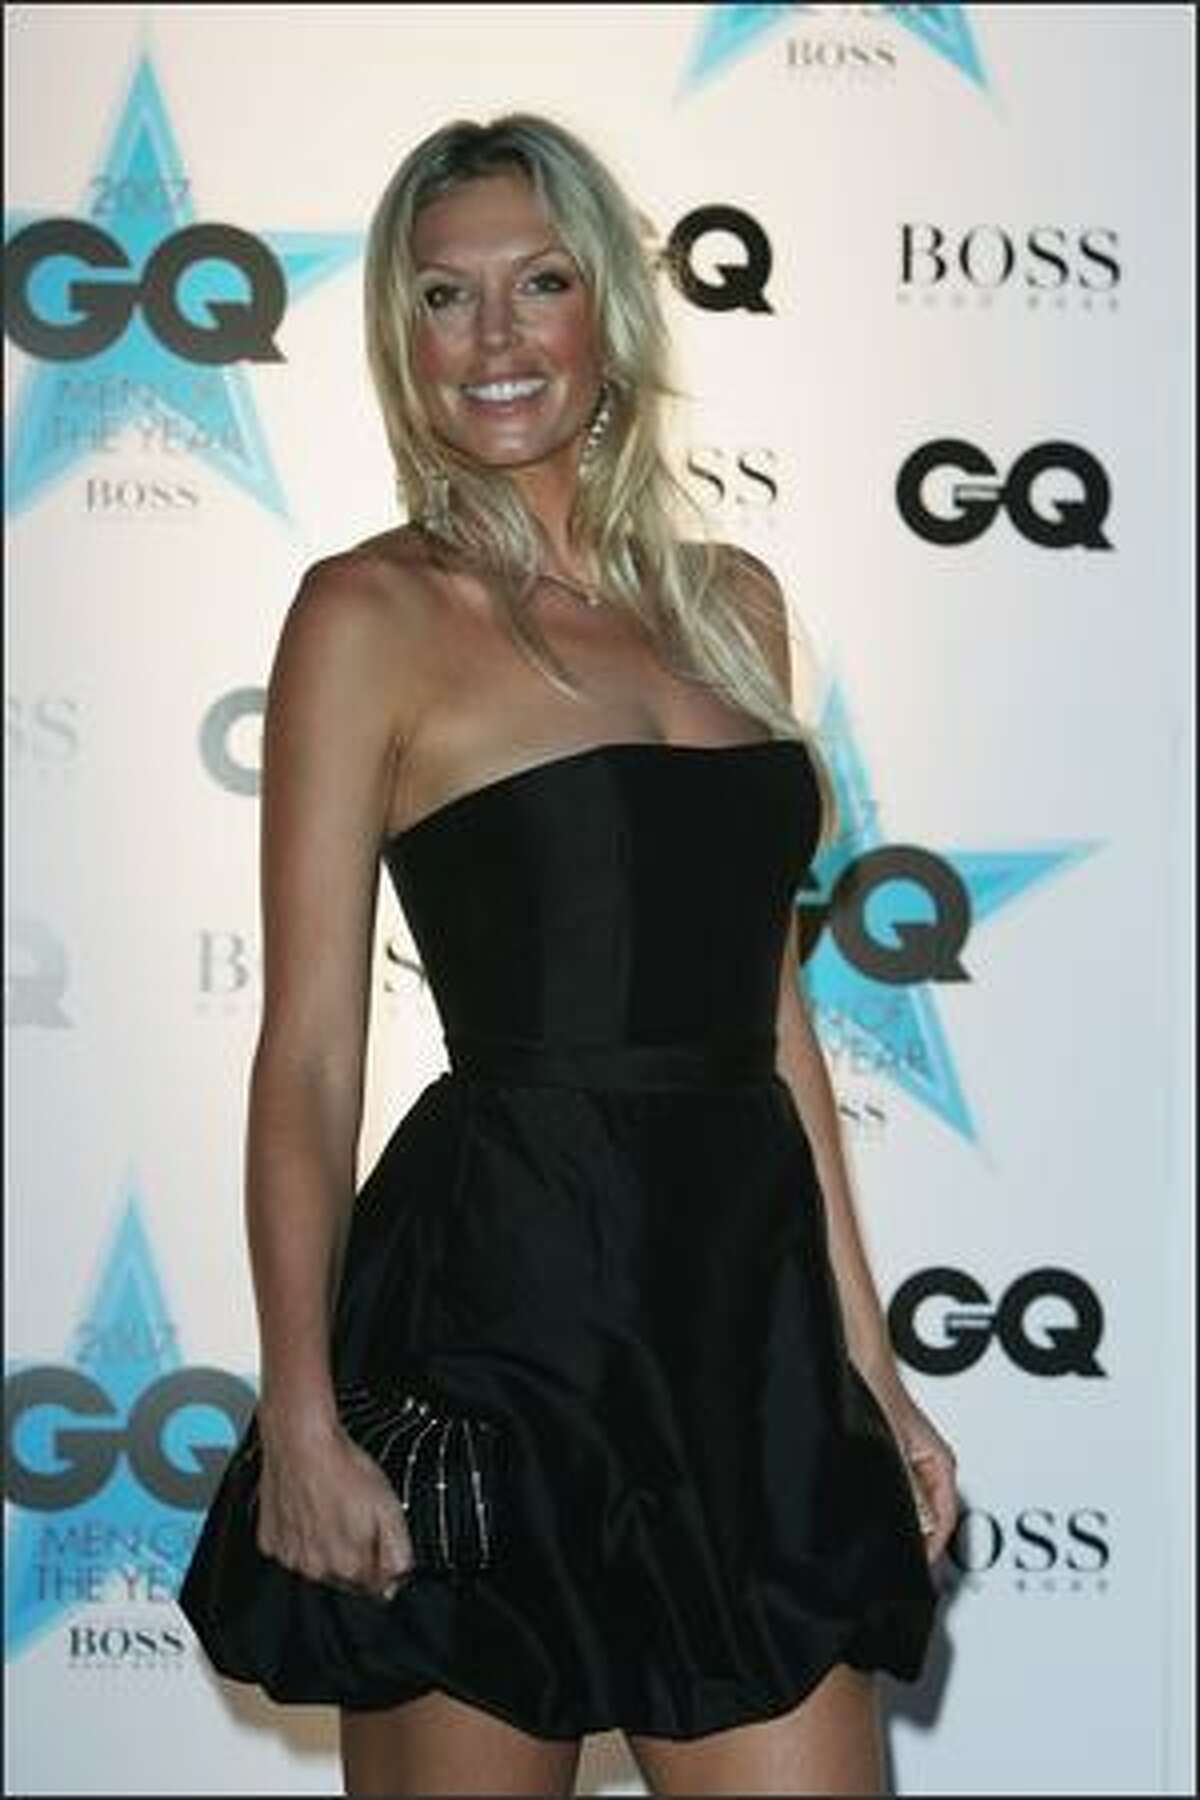 Annalise Braakinsiek and Danny Goldberg attend the GQ Men of the Year Awards at Fox Studios on Tuesday in Sydney, Australia.